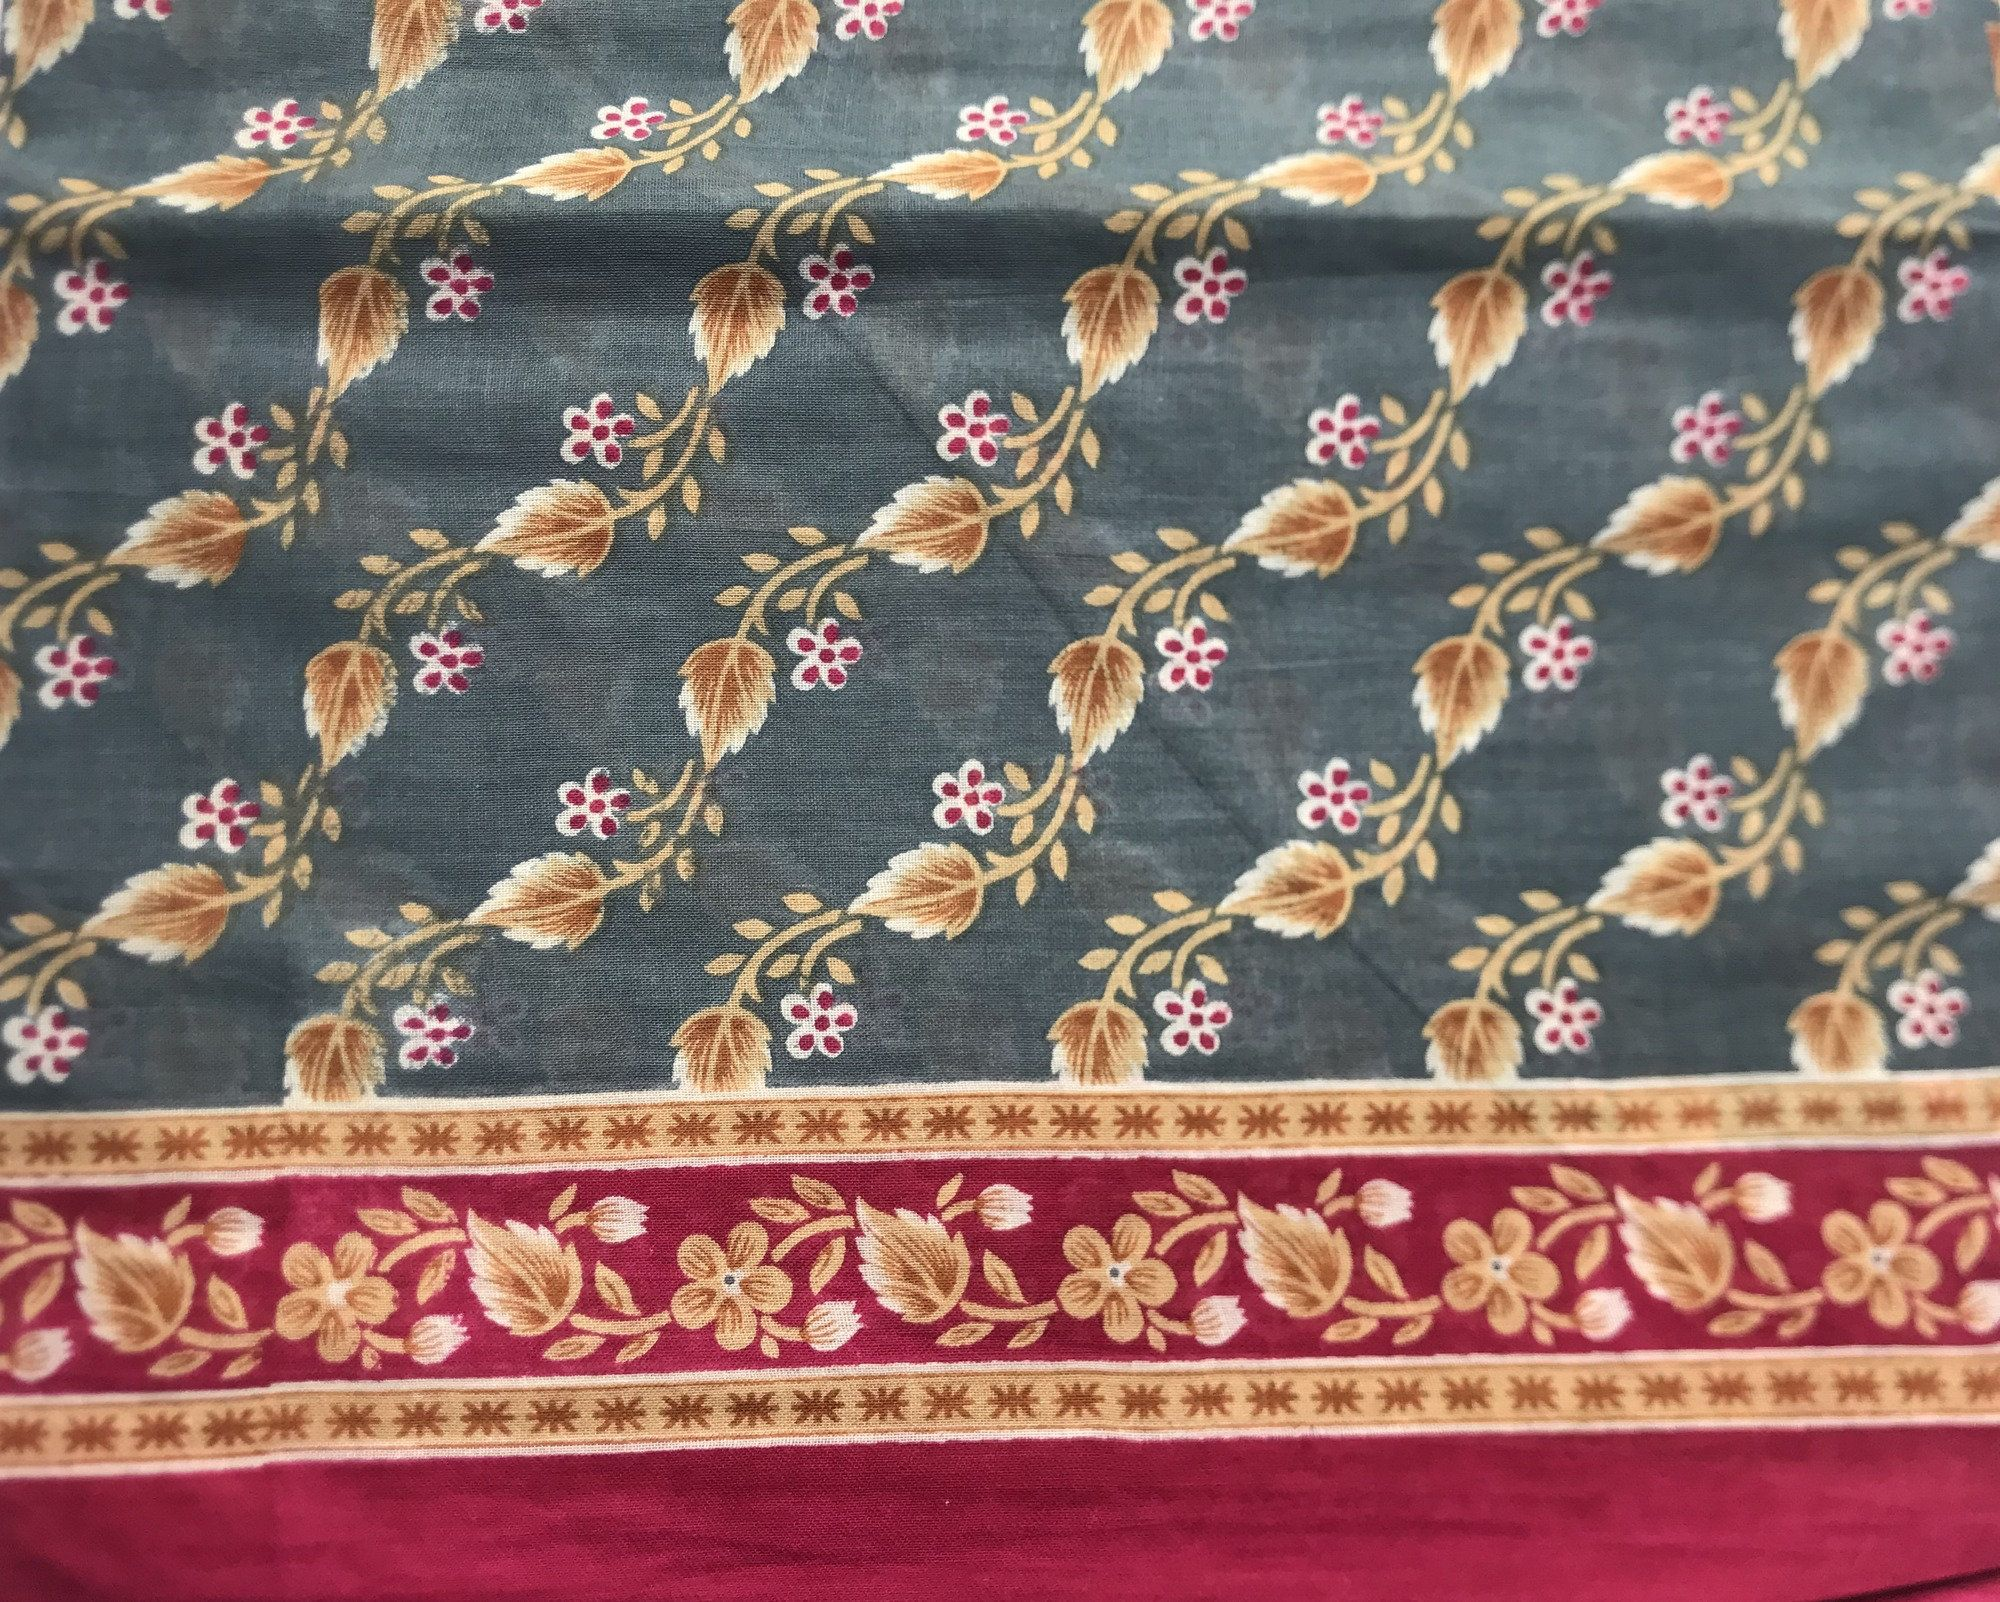 Cotton Saree Fabric Sheer Airy Fabric Sari Fabric By The Yard Green Heart Print Fabric Striped Cotton Saree Fabric Floral Print Fabric